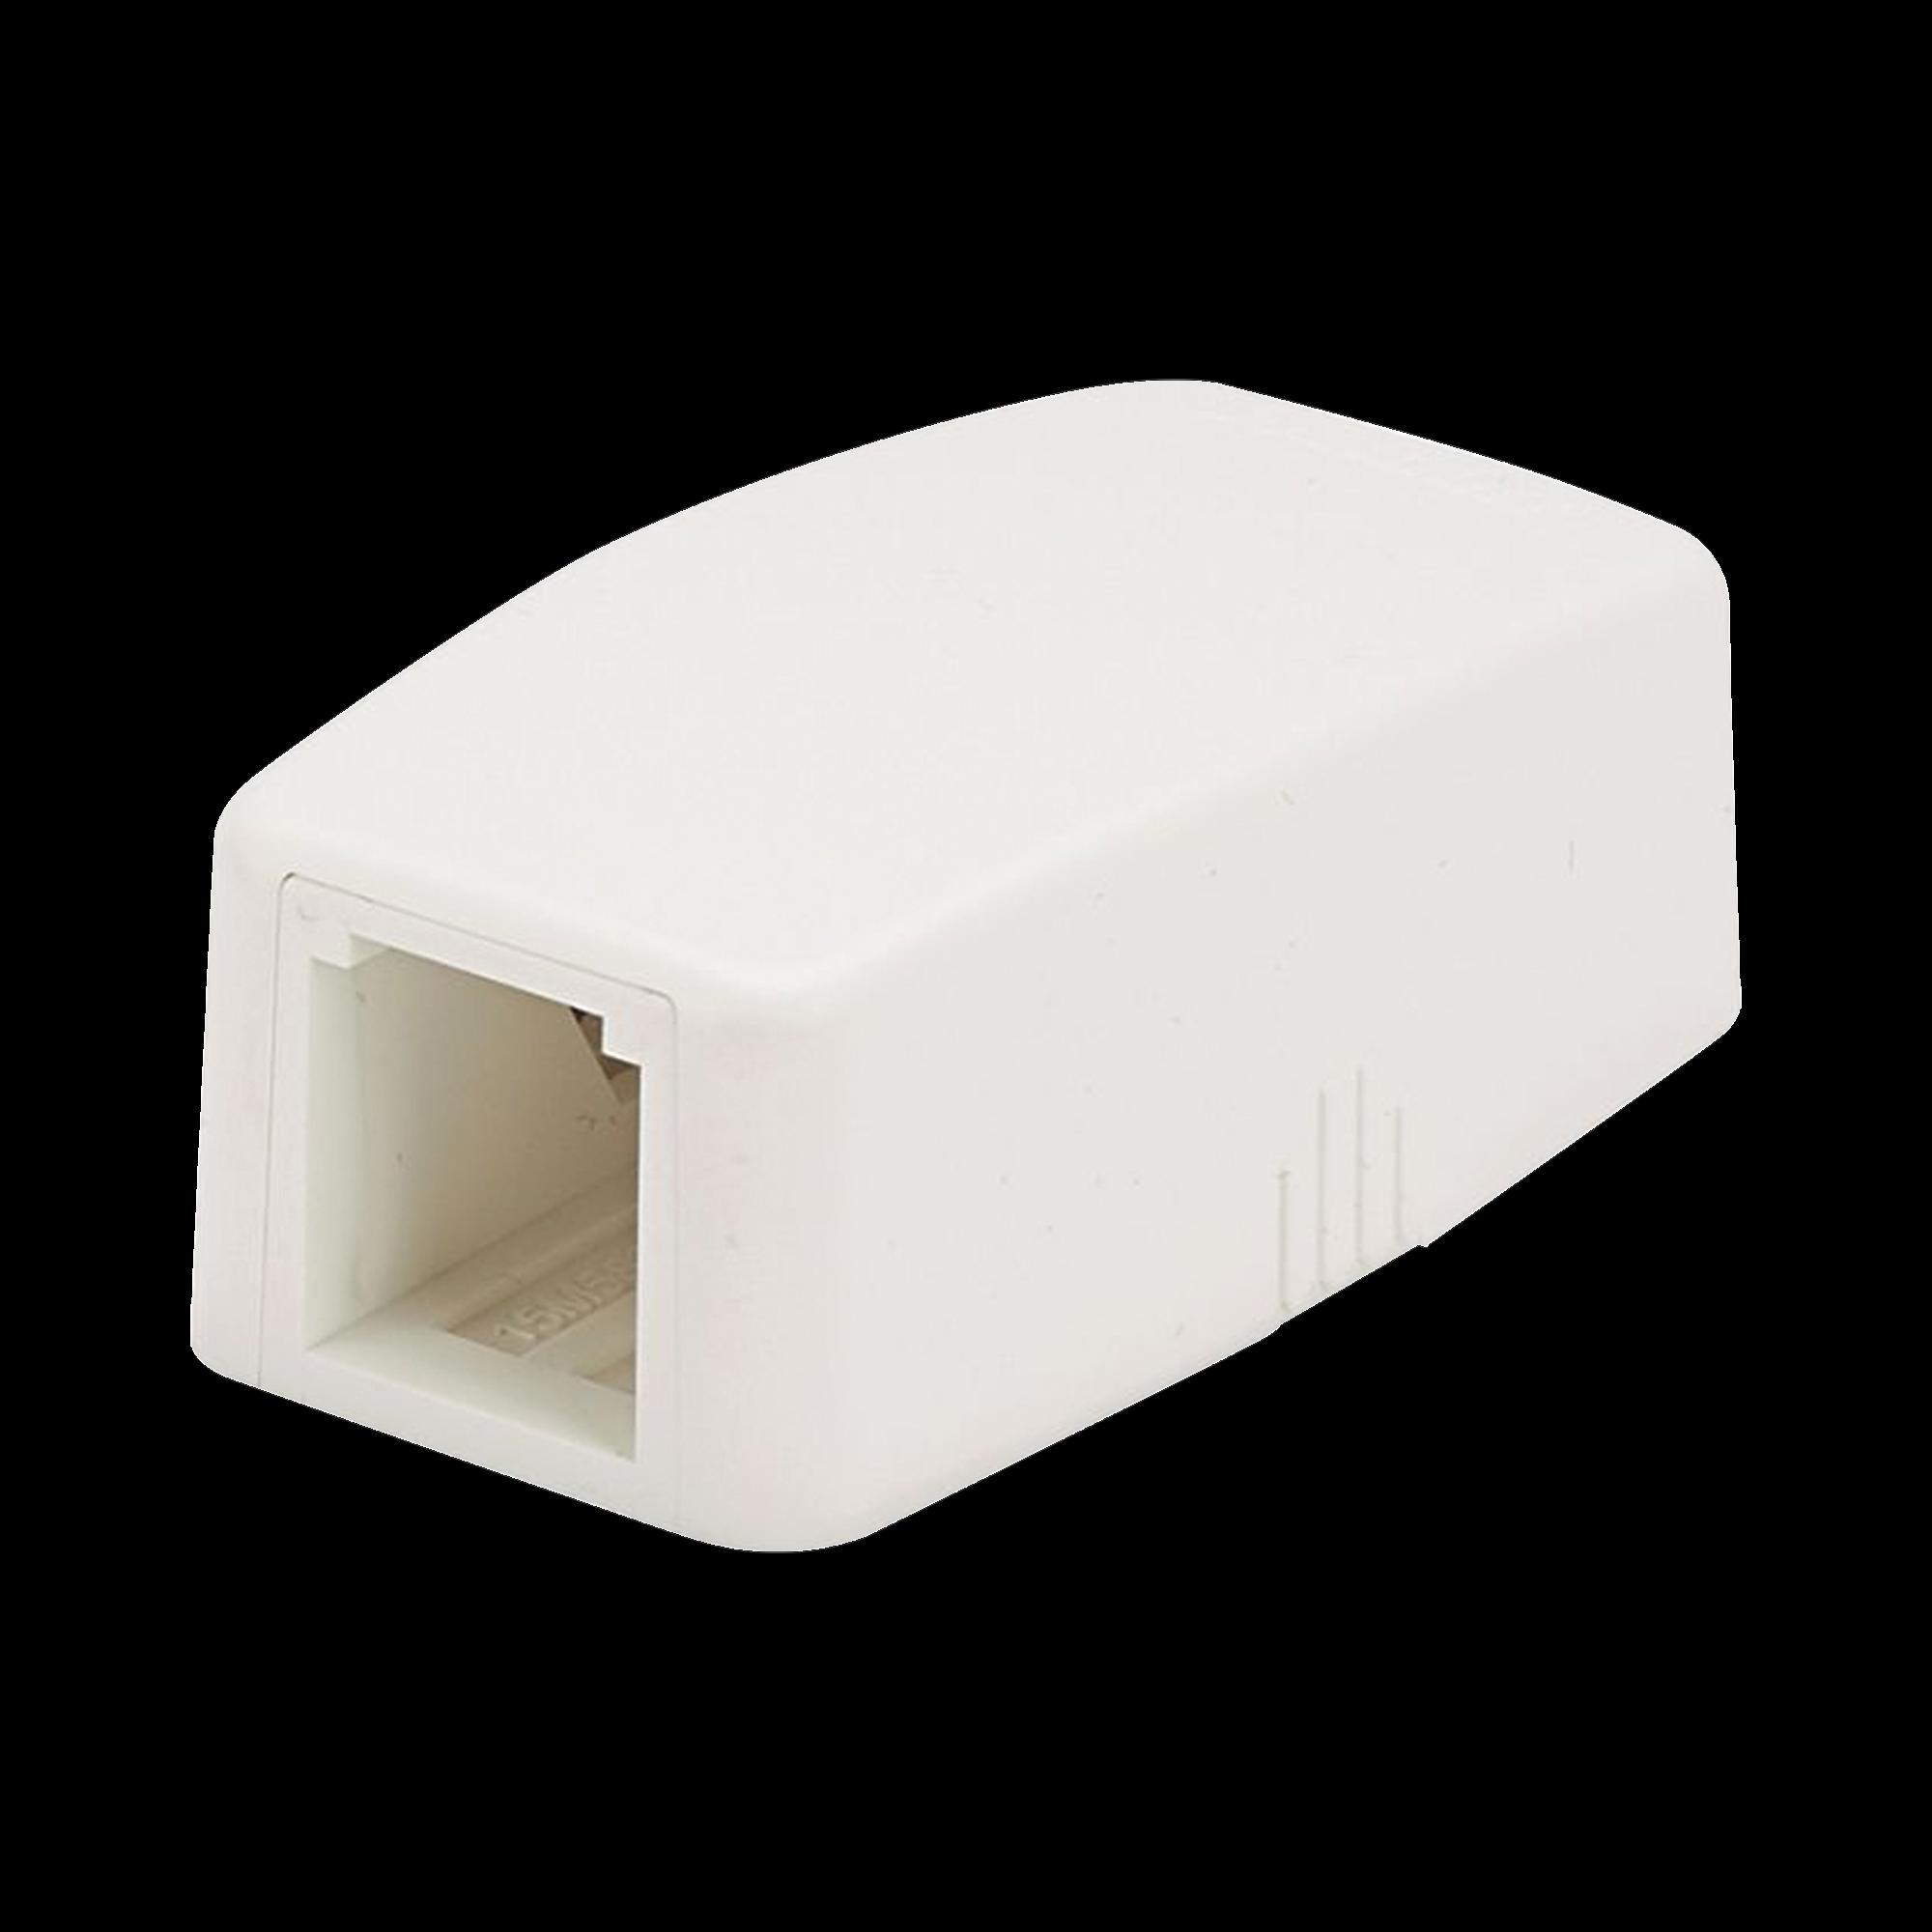 Caja de Montaje en Superficie, Para 1 Módulo Mini-Com, Color Blanco Mate